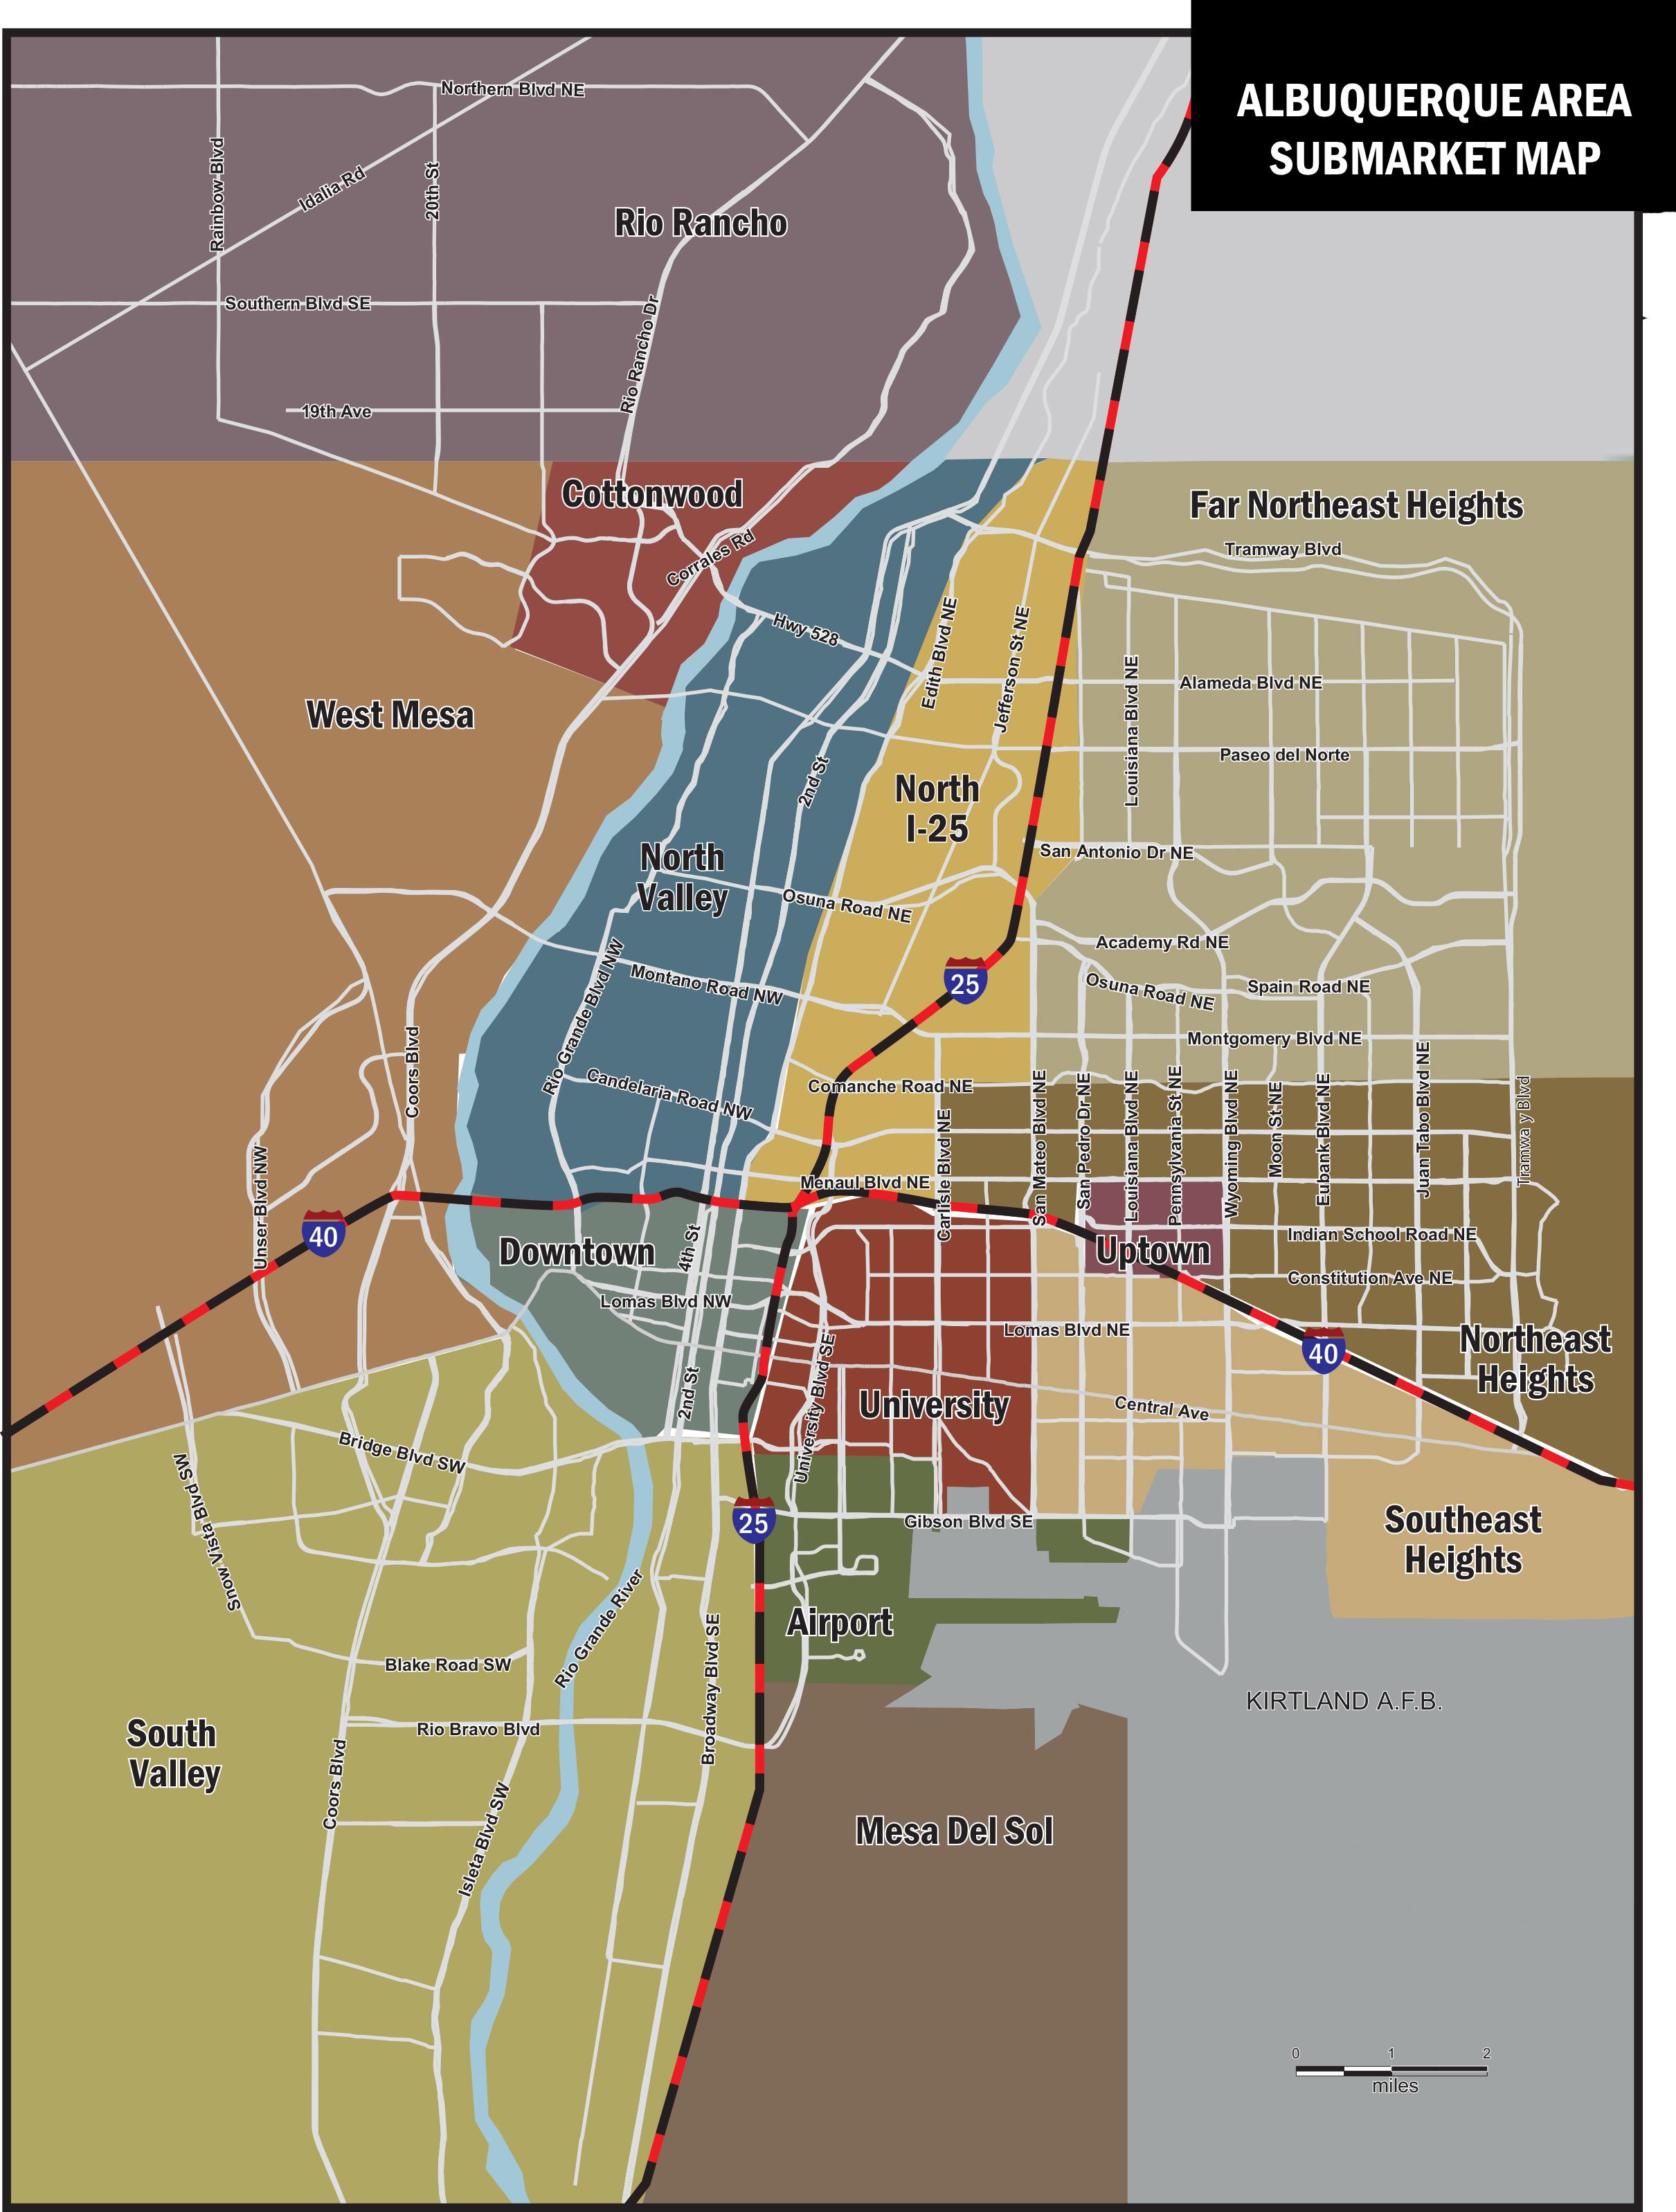 Albuquerque Submarket Map